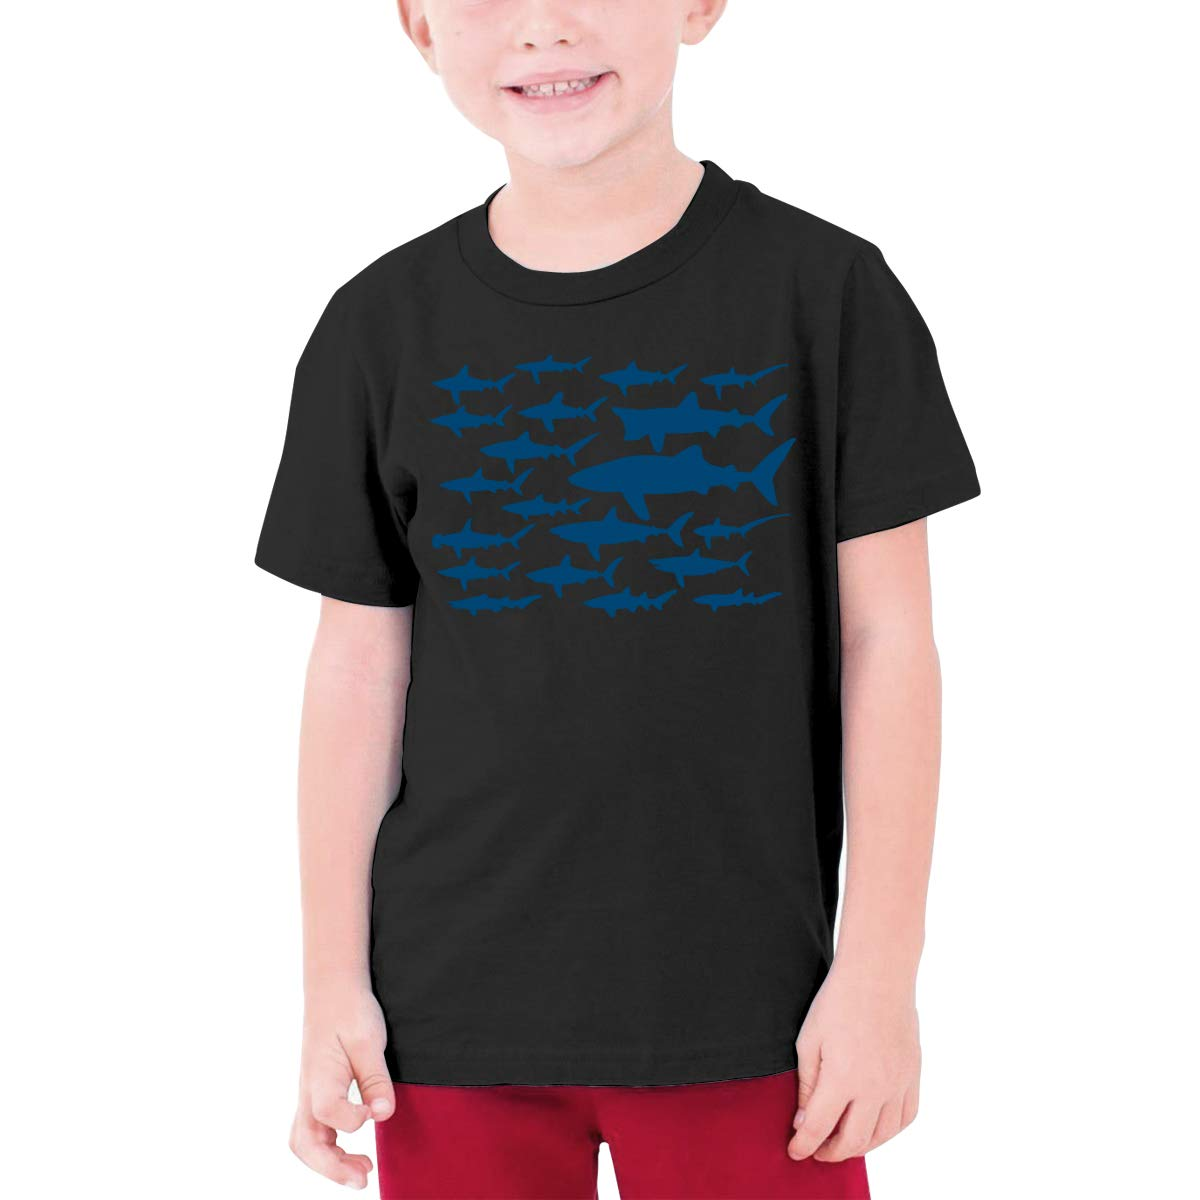 Youth Graphic Tshirts Teenage Boys Girls Short Sleeve T-Shirt Ocean Shark Floral Sea Fish Printed T Shirt Tees Tops